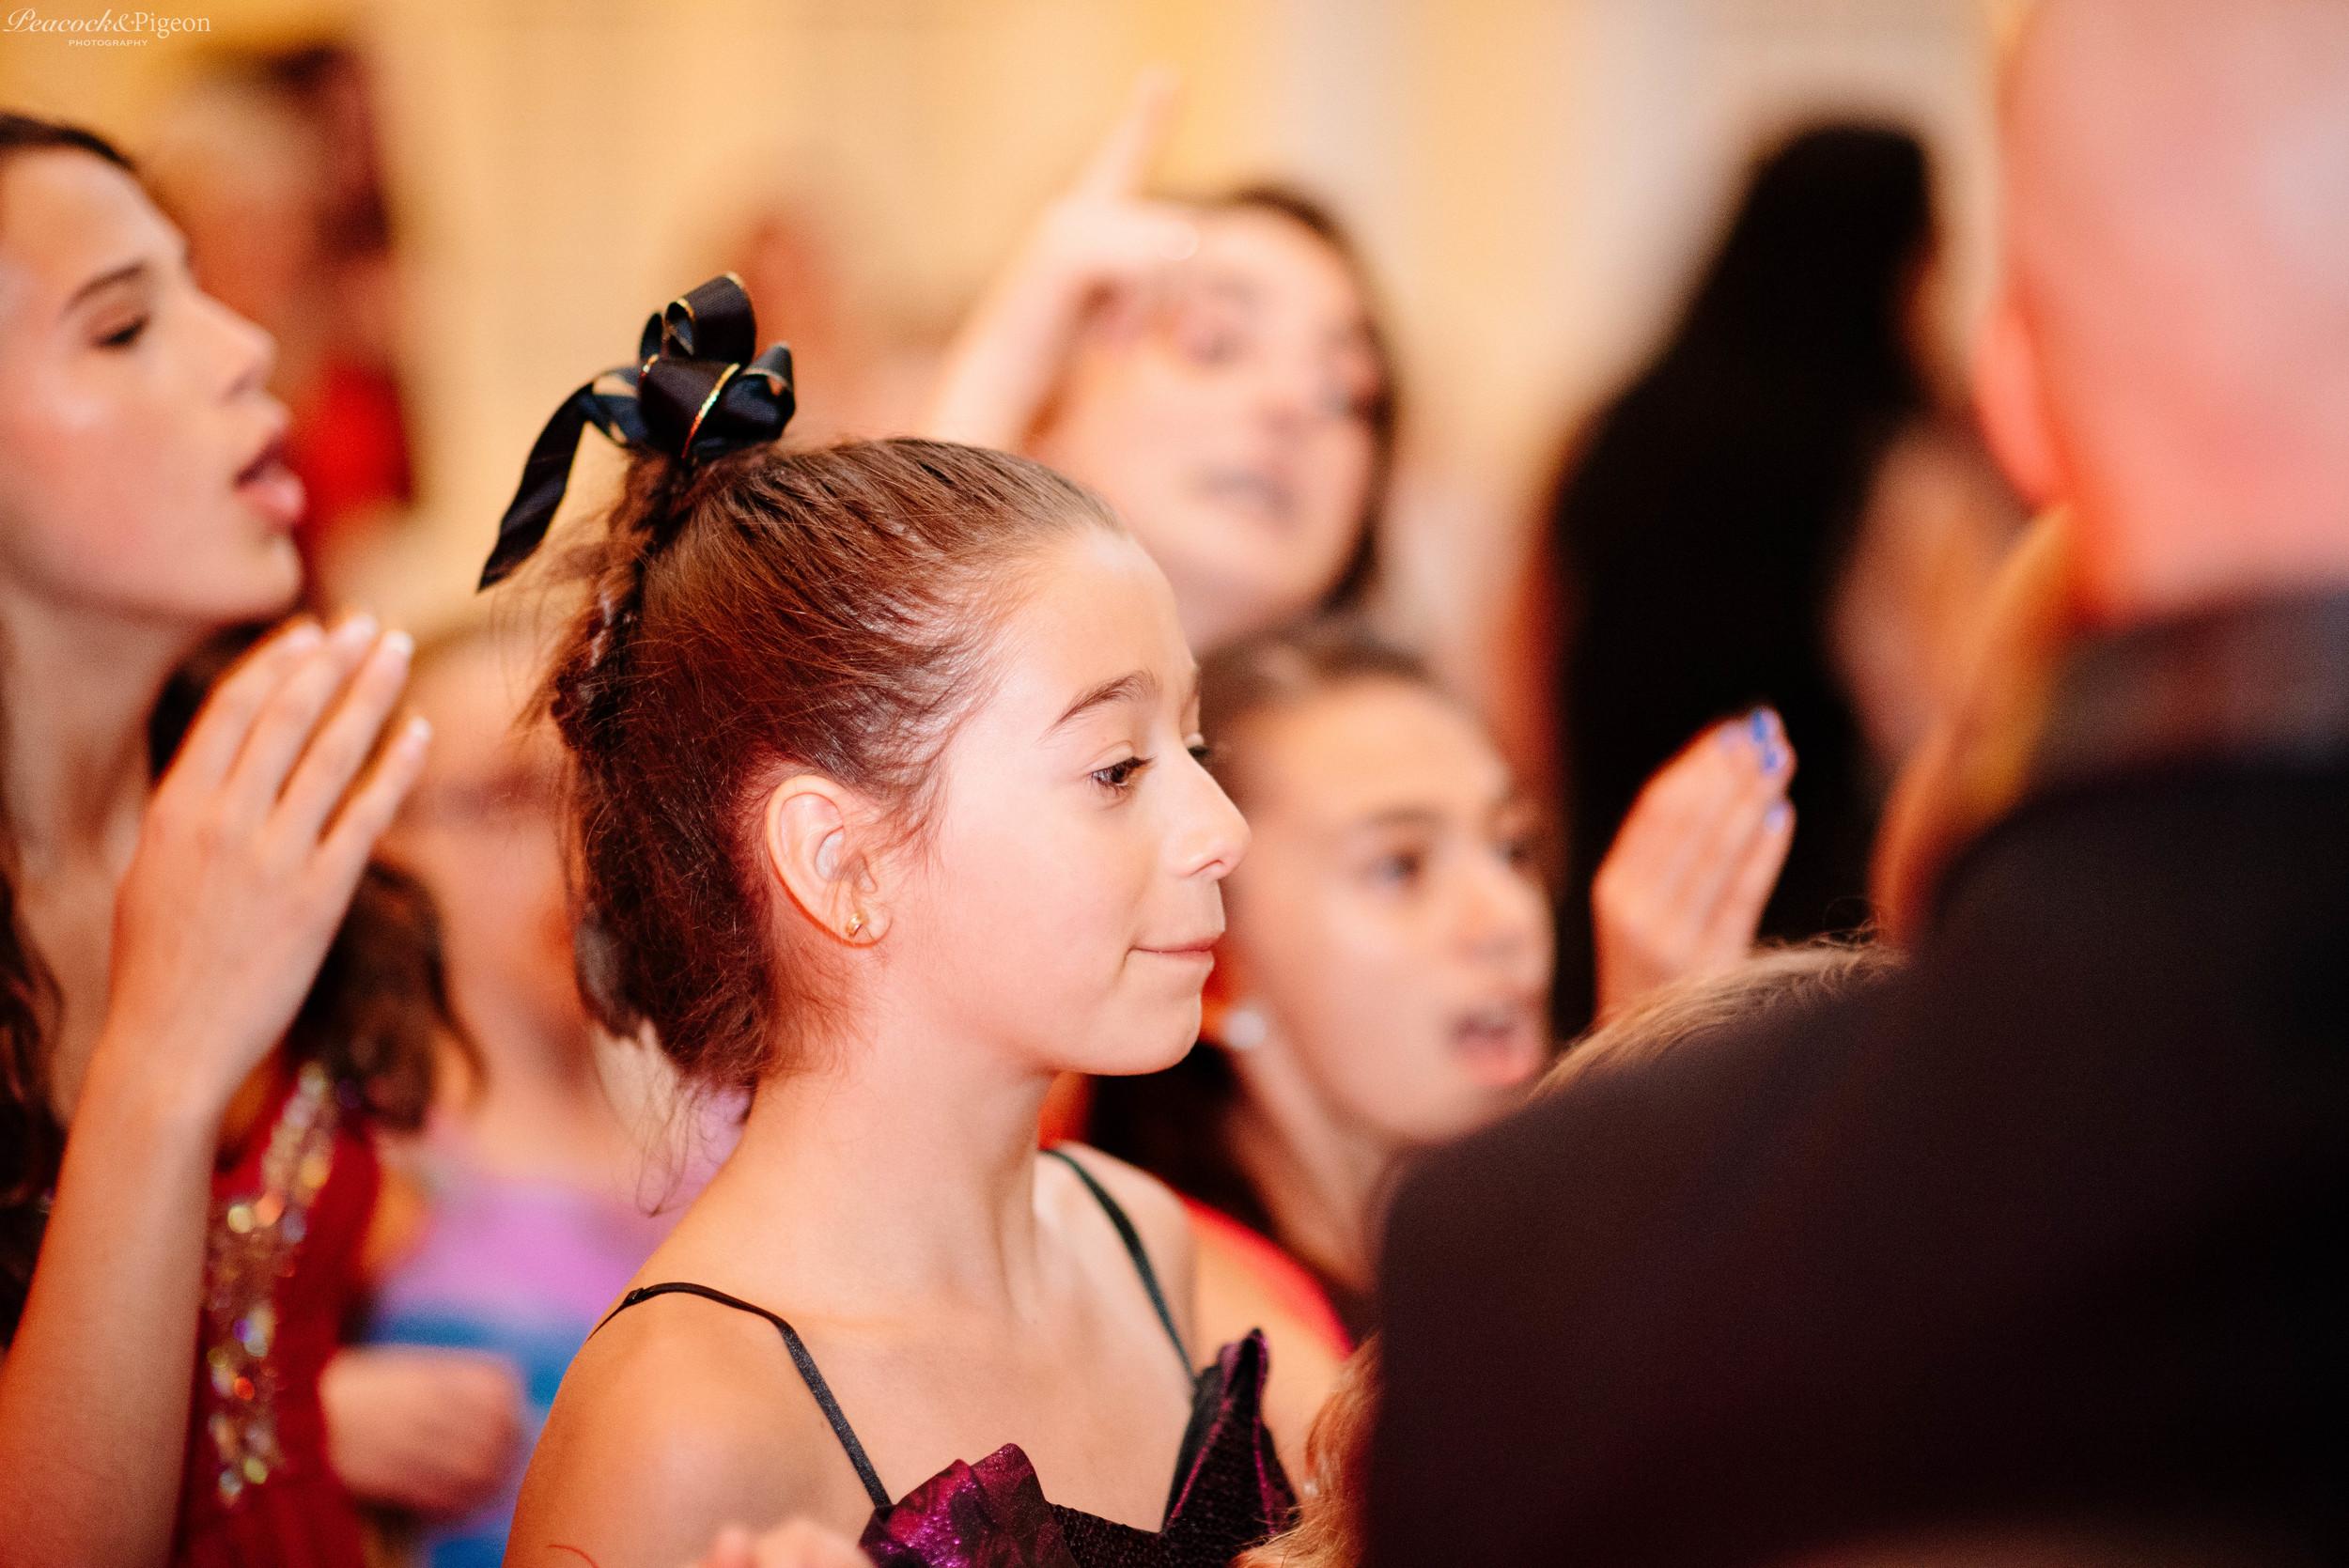 Next_Level_All_Star_Dance_School_Part2B-W-69-180.jpg